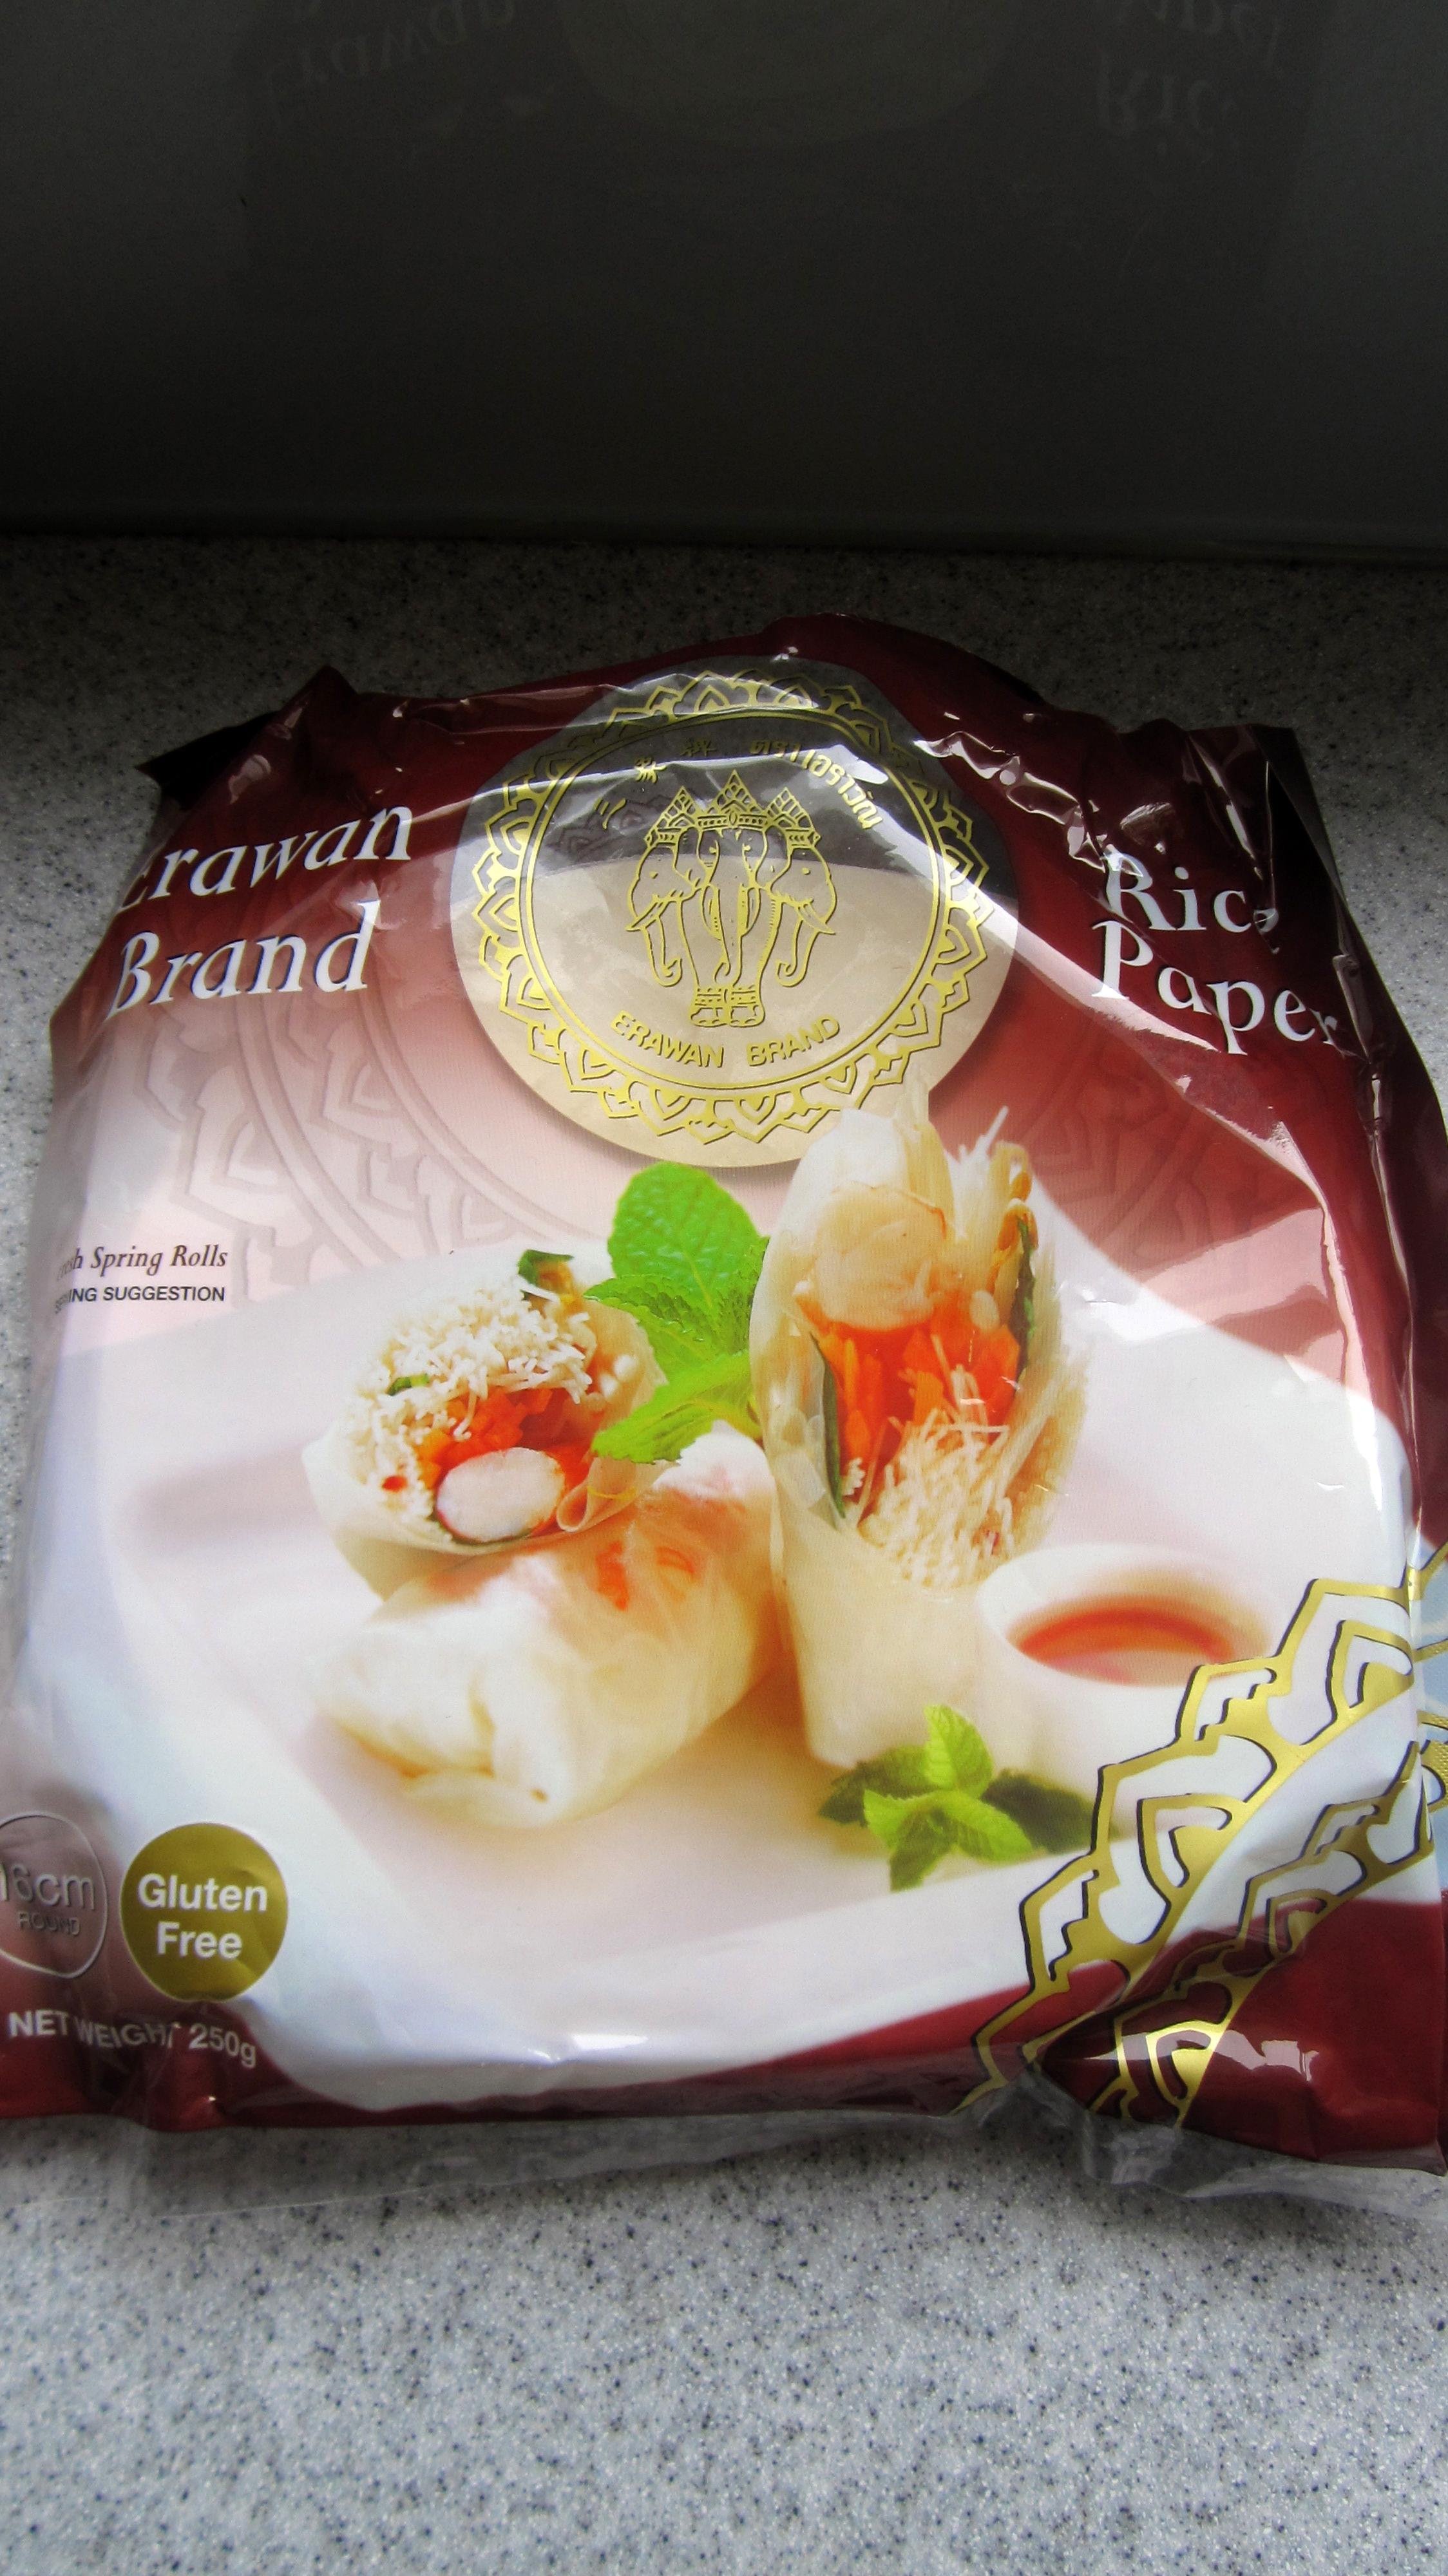 Vietnamese-Style Fresh Spring Rolls (Summer Rolls) with Peanut Sauce - Vegan / Gluten-Free